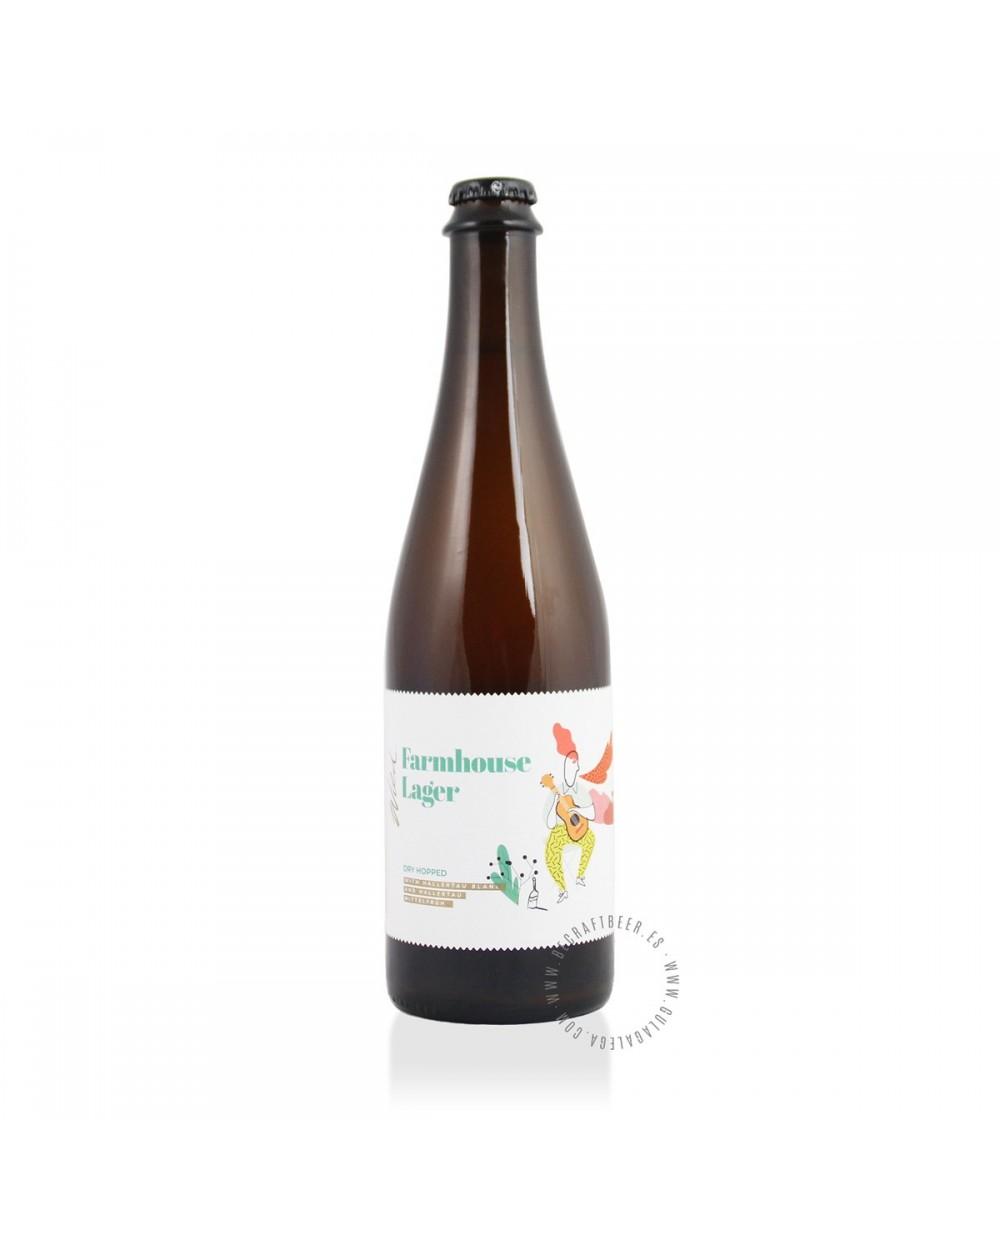 Cerveza Artesana STU MOSTÓW Wild 9 Farmhouse Lager 50 cl.